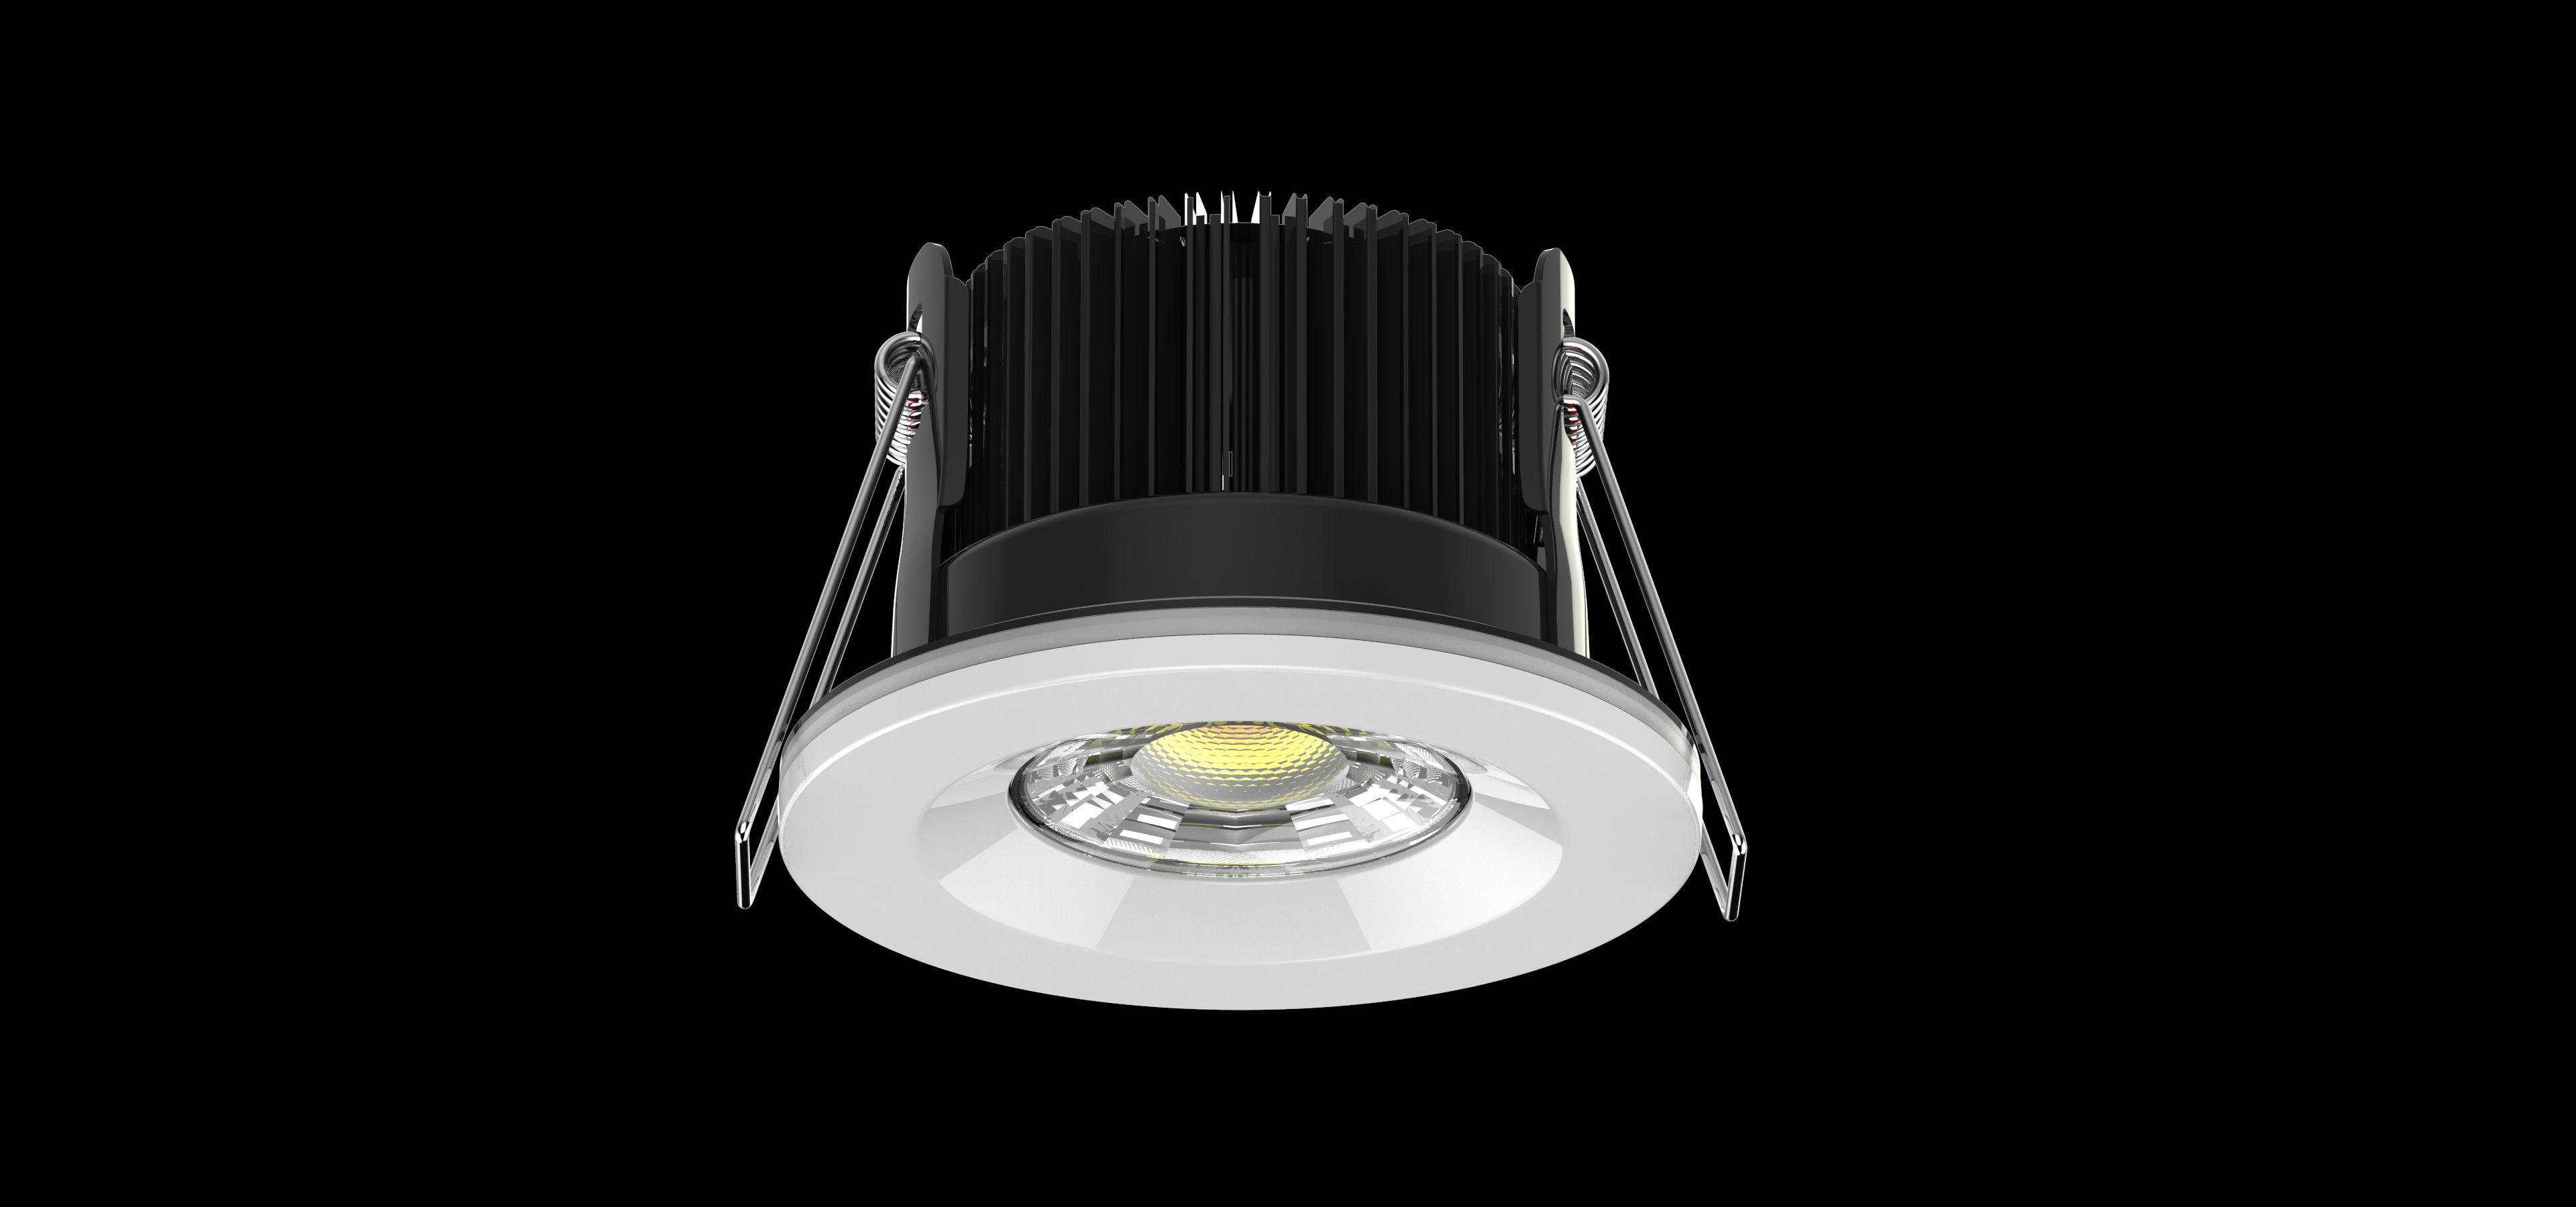 nordlicht beleuchtungssysteme gmbh nl cf10 68il illumination 240v ac led einbaustrahler. Black Bedroom Furniture Sets. Home Design Ideas